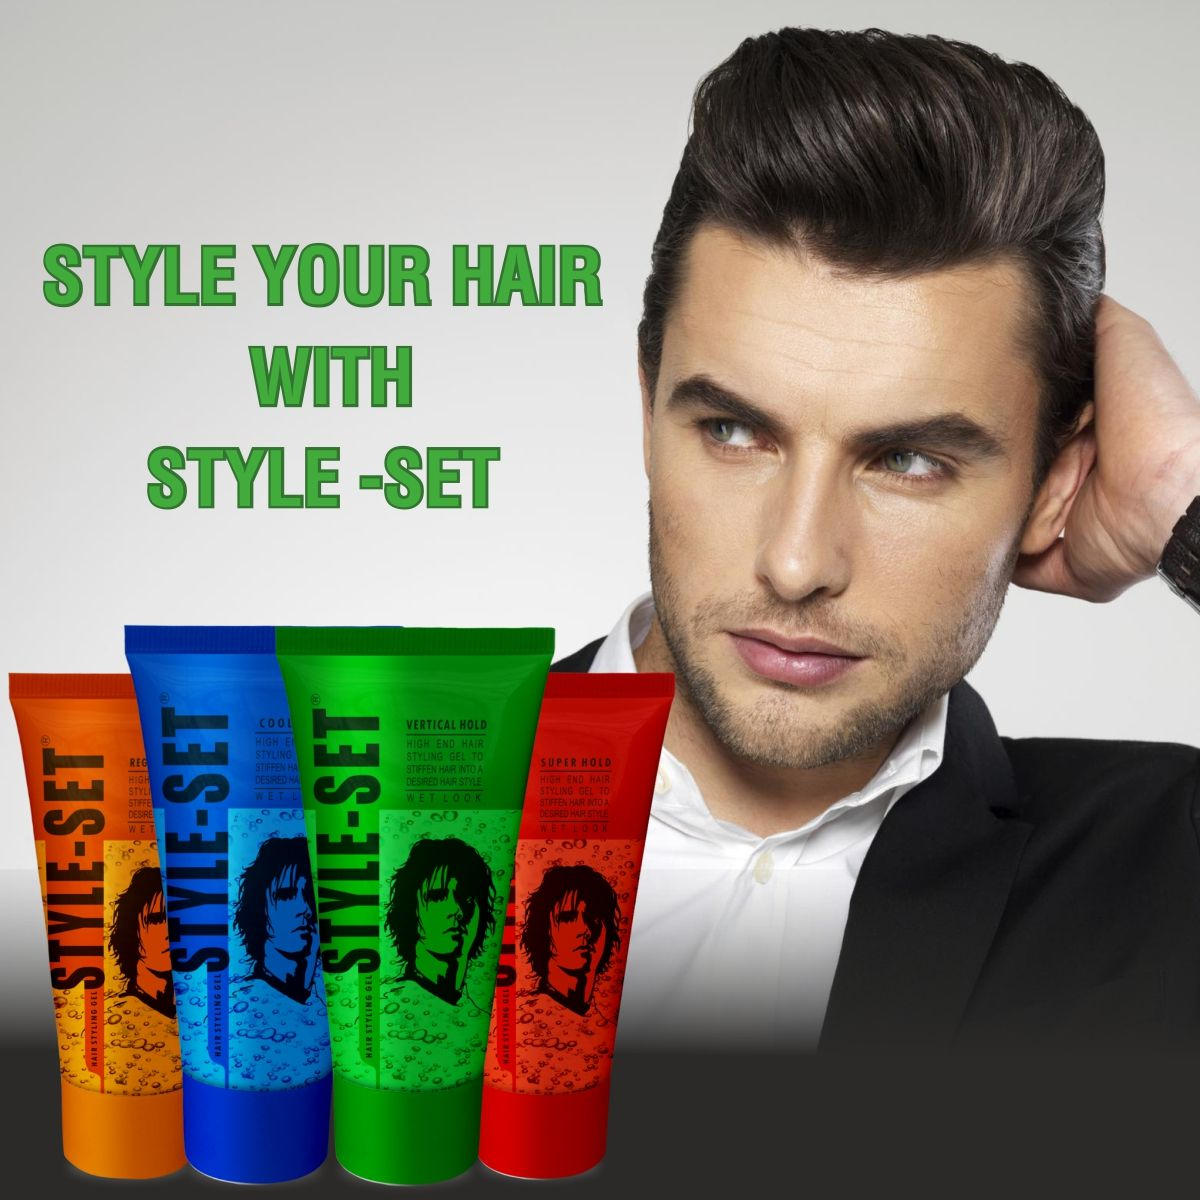 Hair Styling Gels For Men Vi John In 2020 Styling Gel Hair Gel For Men Hair Gel